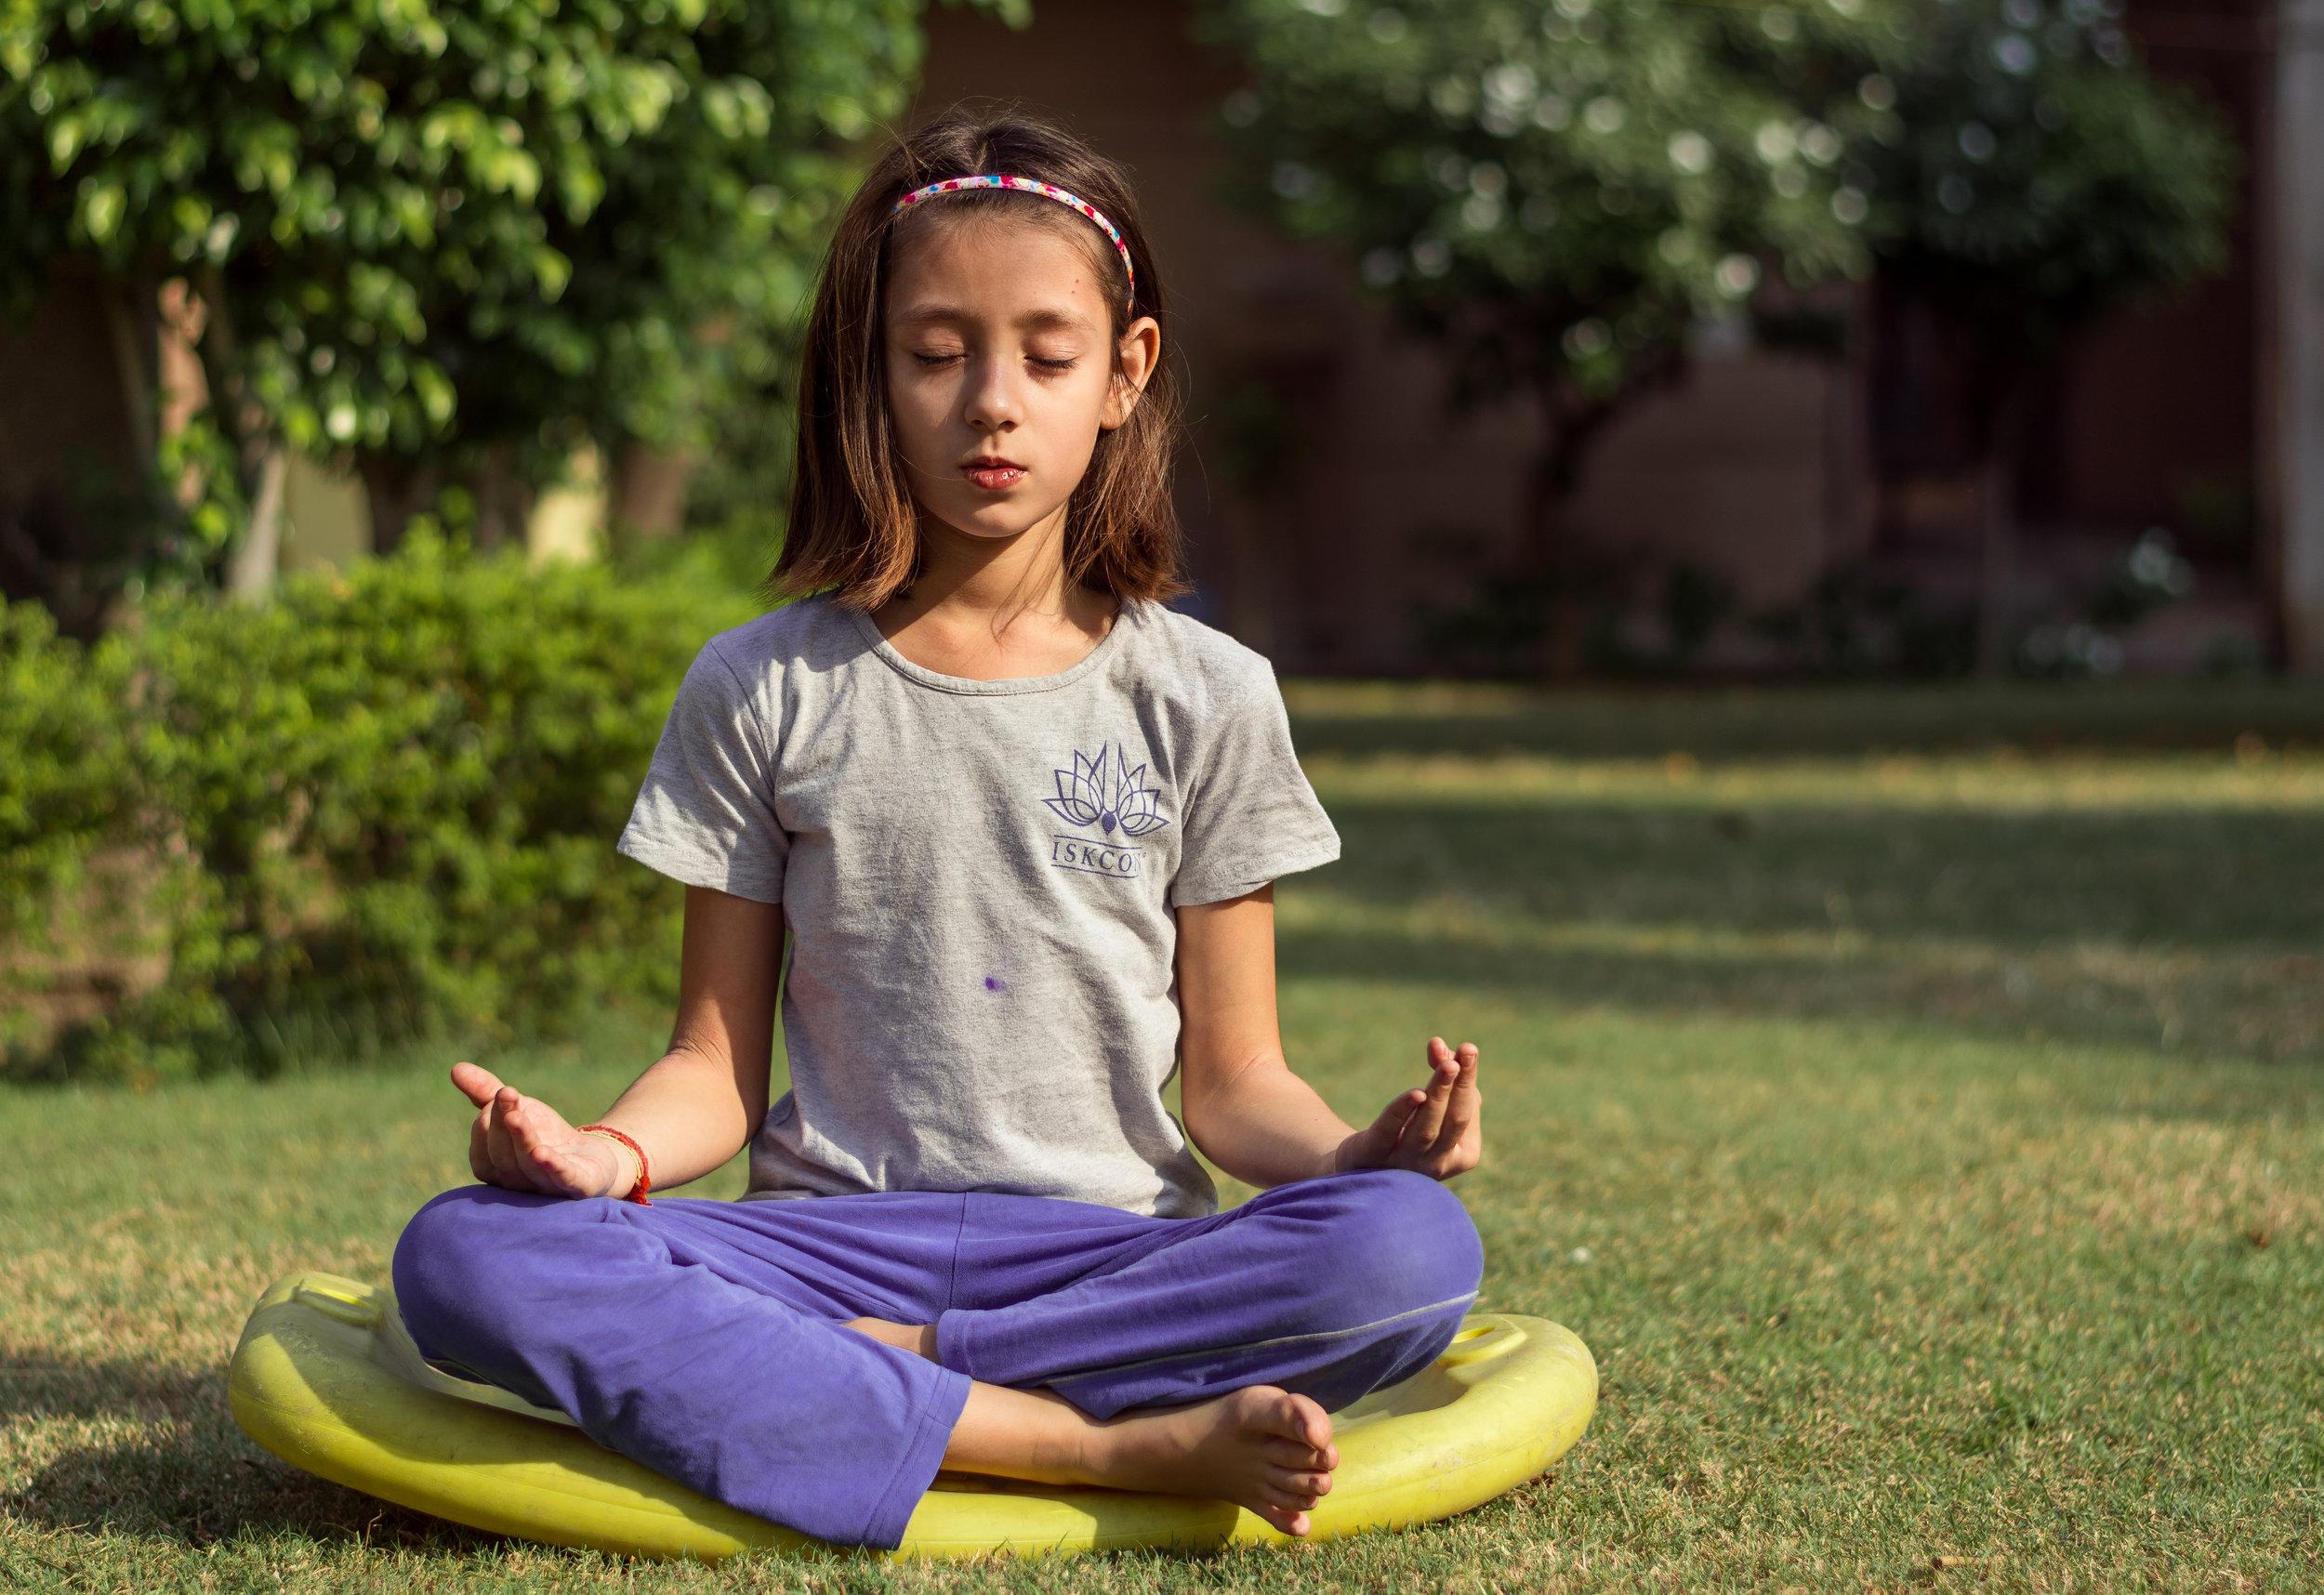 pittsburgh-kids-yoga